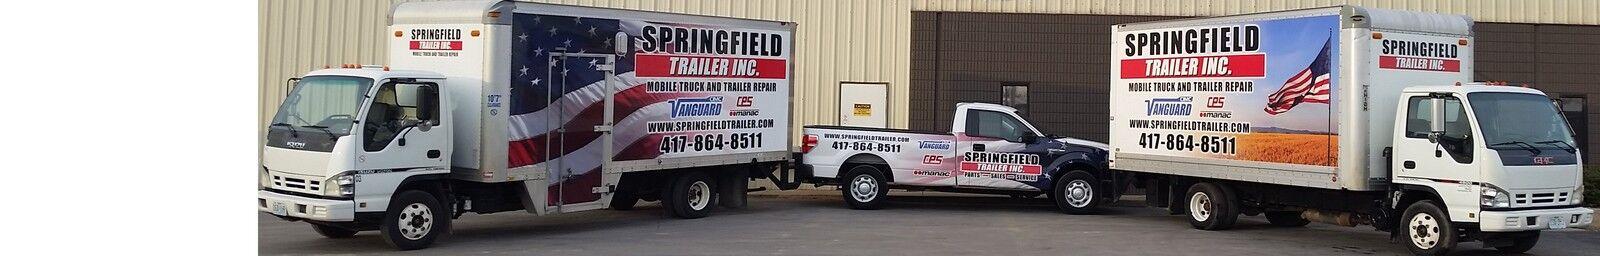 springfieldtrailerinc